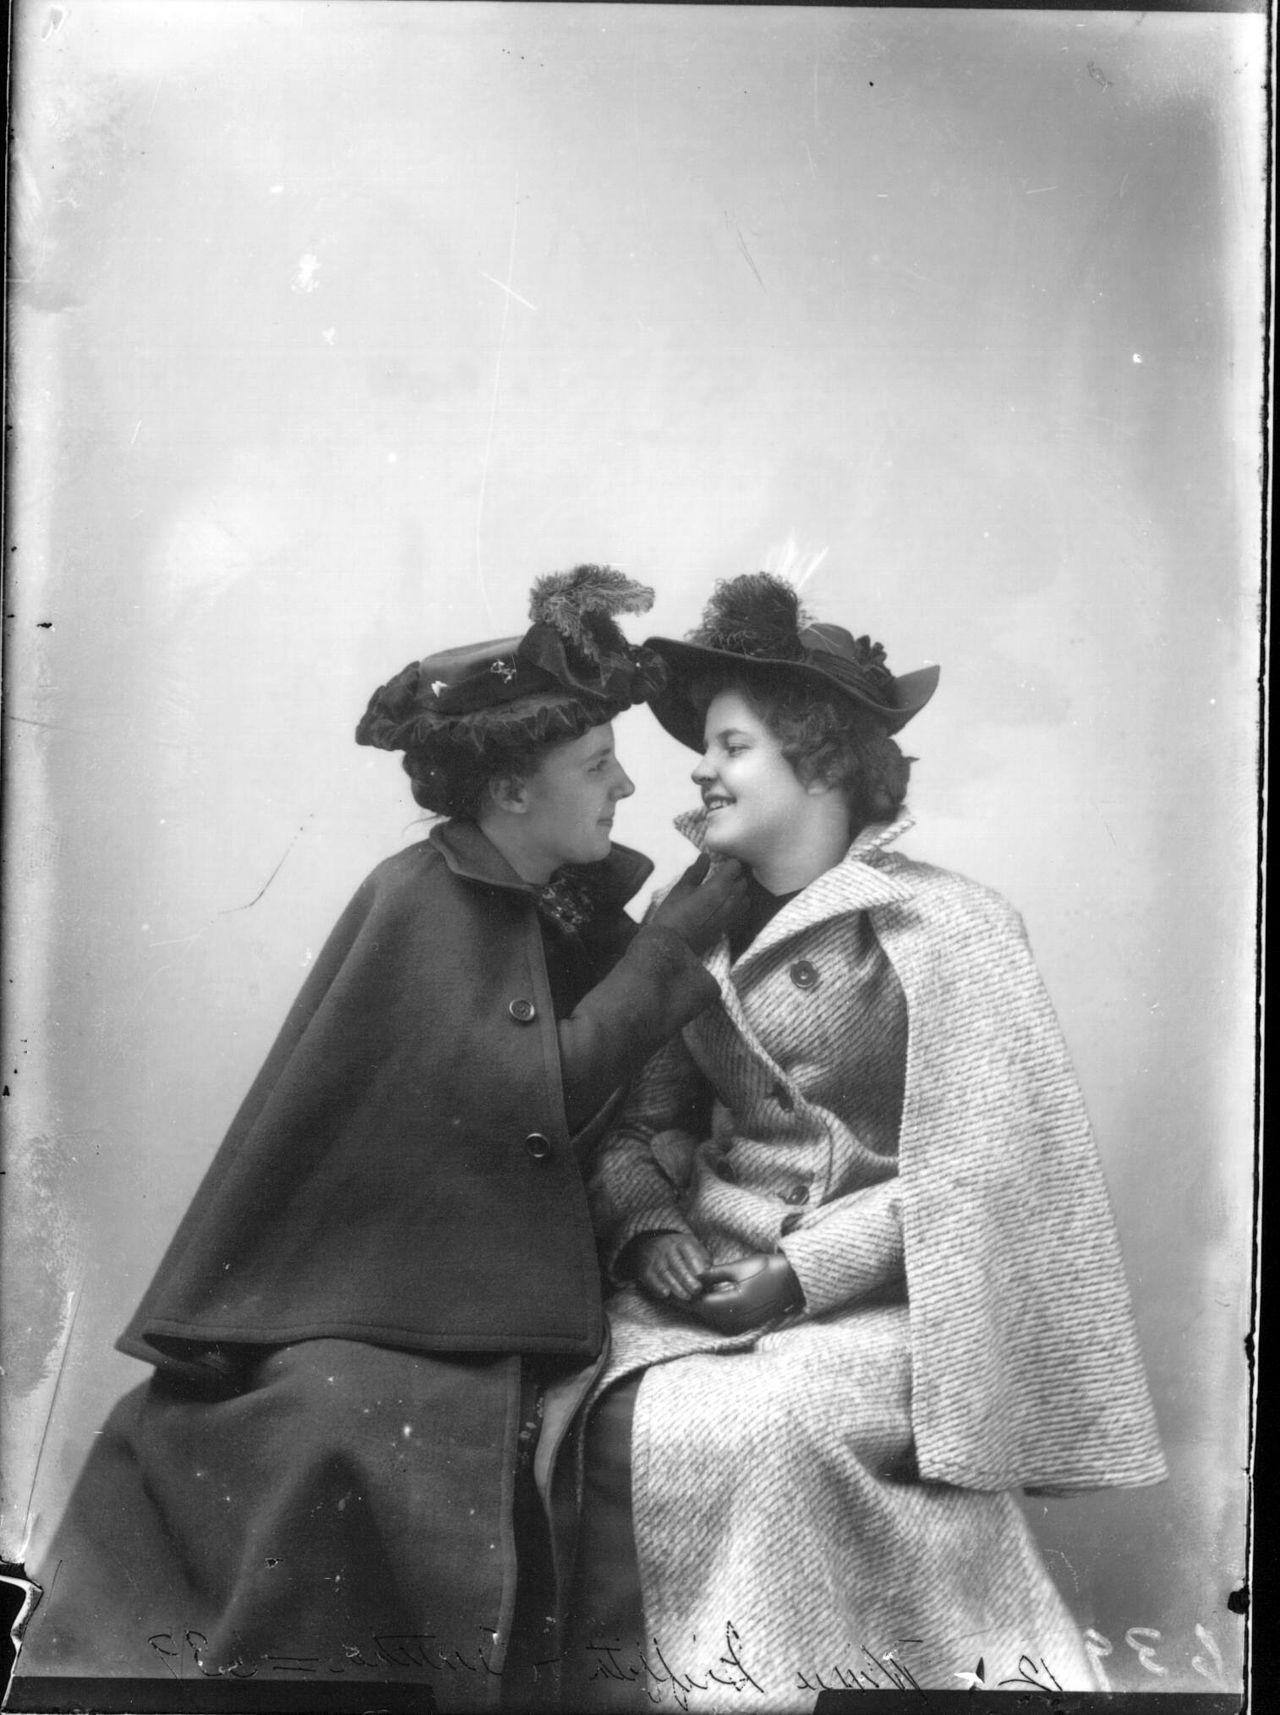 Portrait_photograph_of_Miss_M._R._Griffith_and_Miss_M._H._Crutcher_n.d._(3191809813).jpg